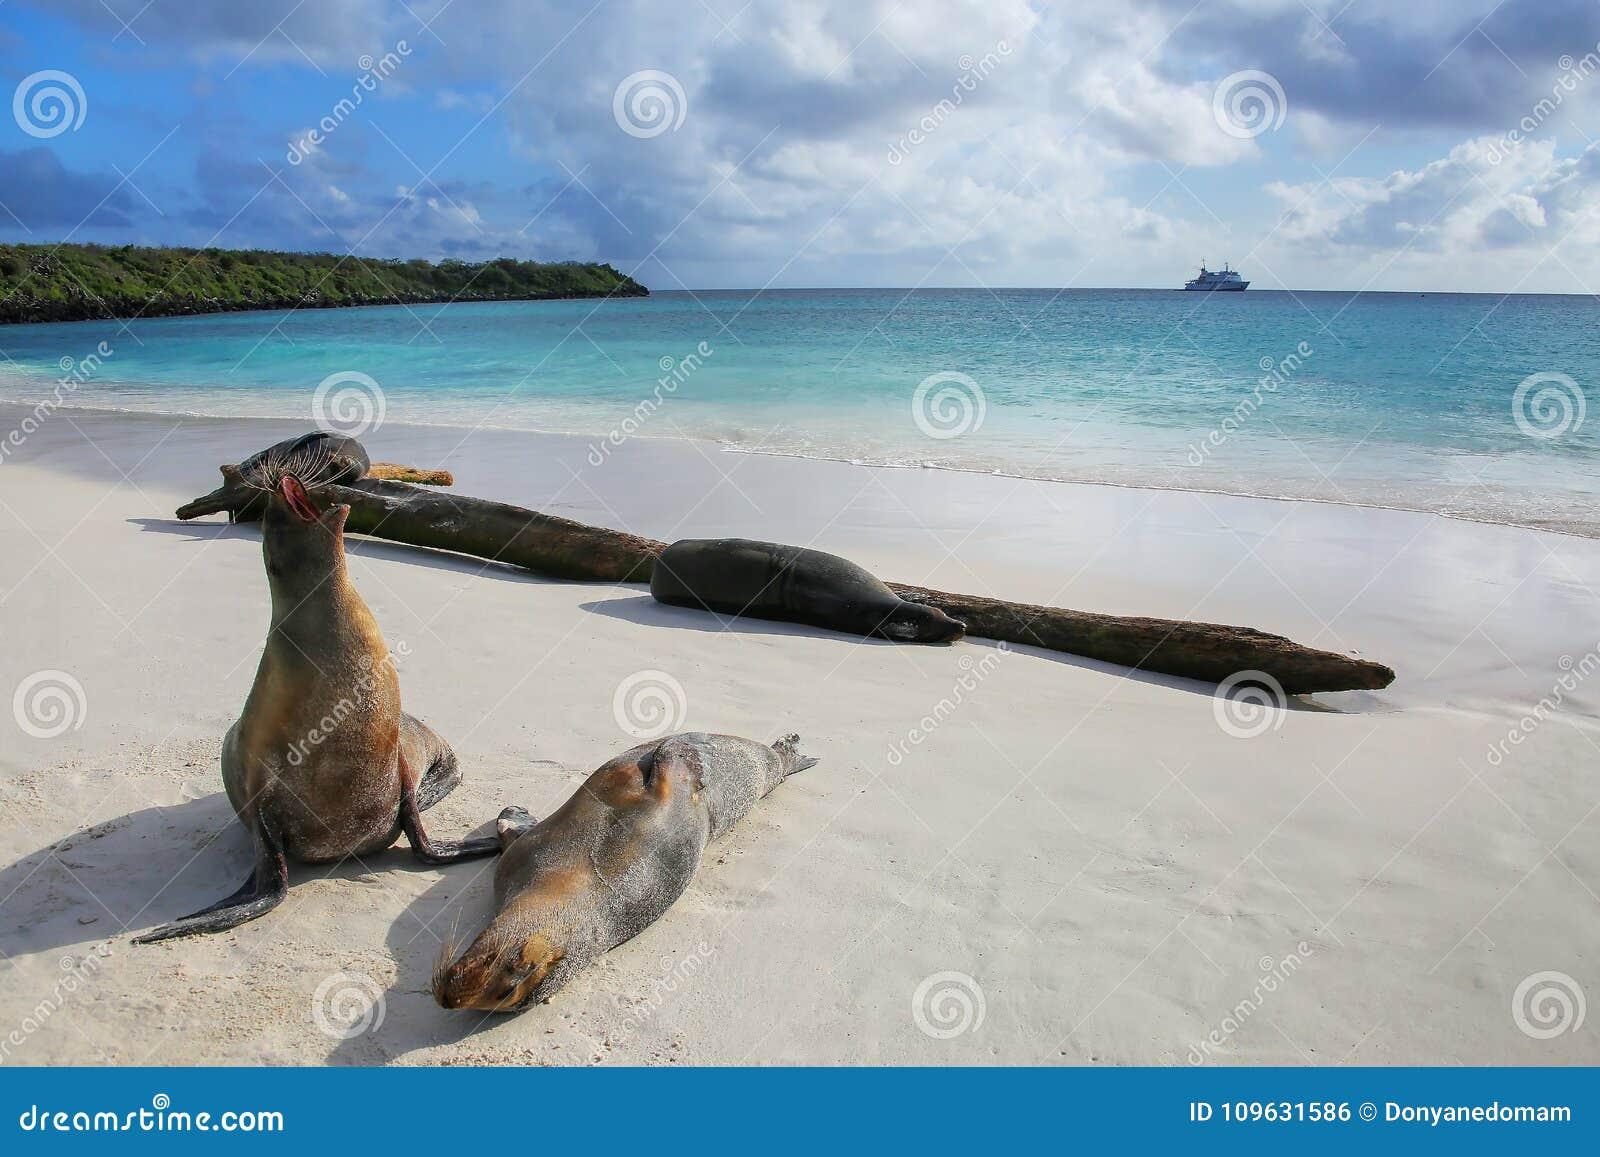 Galapagos-Seelöwen auf dem Strand bei Gardner Bay, Espanola-Insel